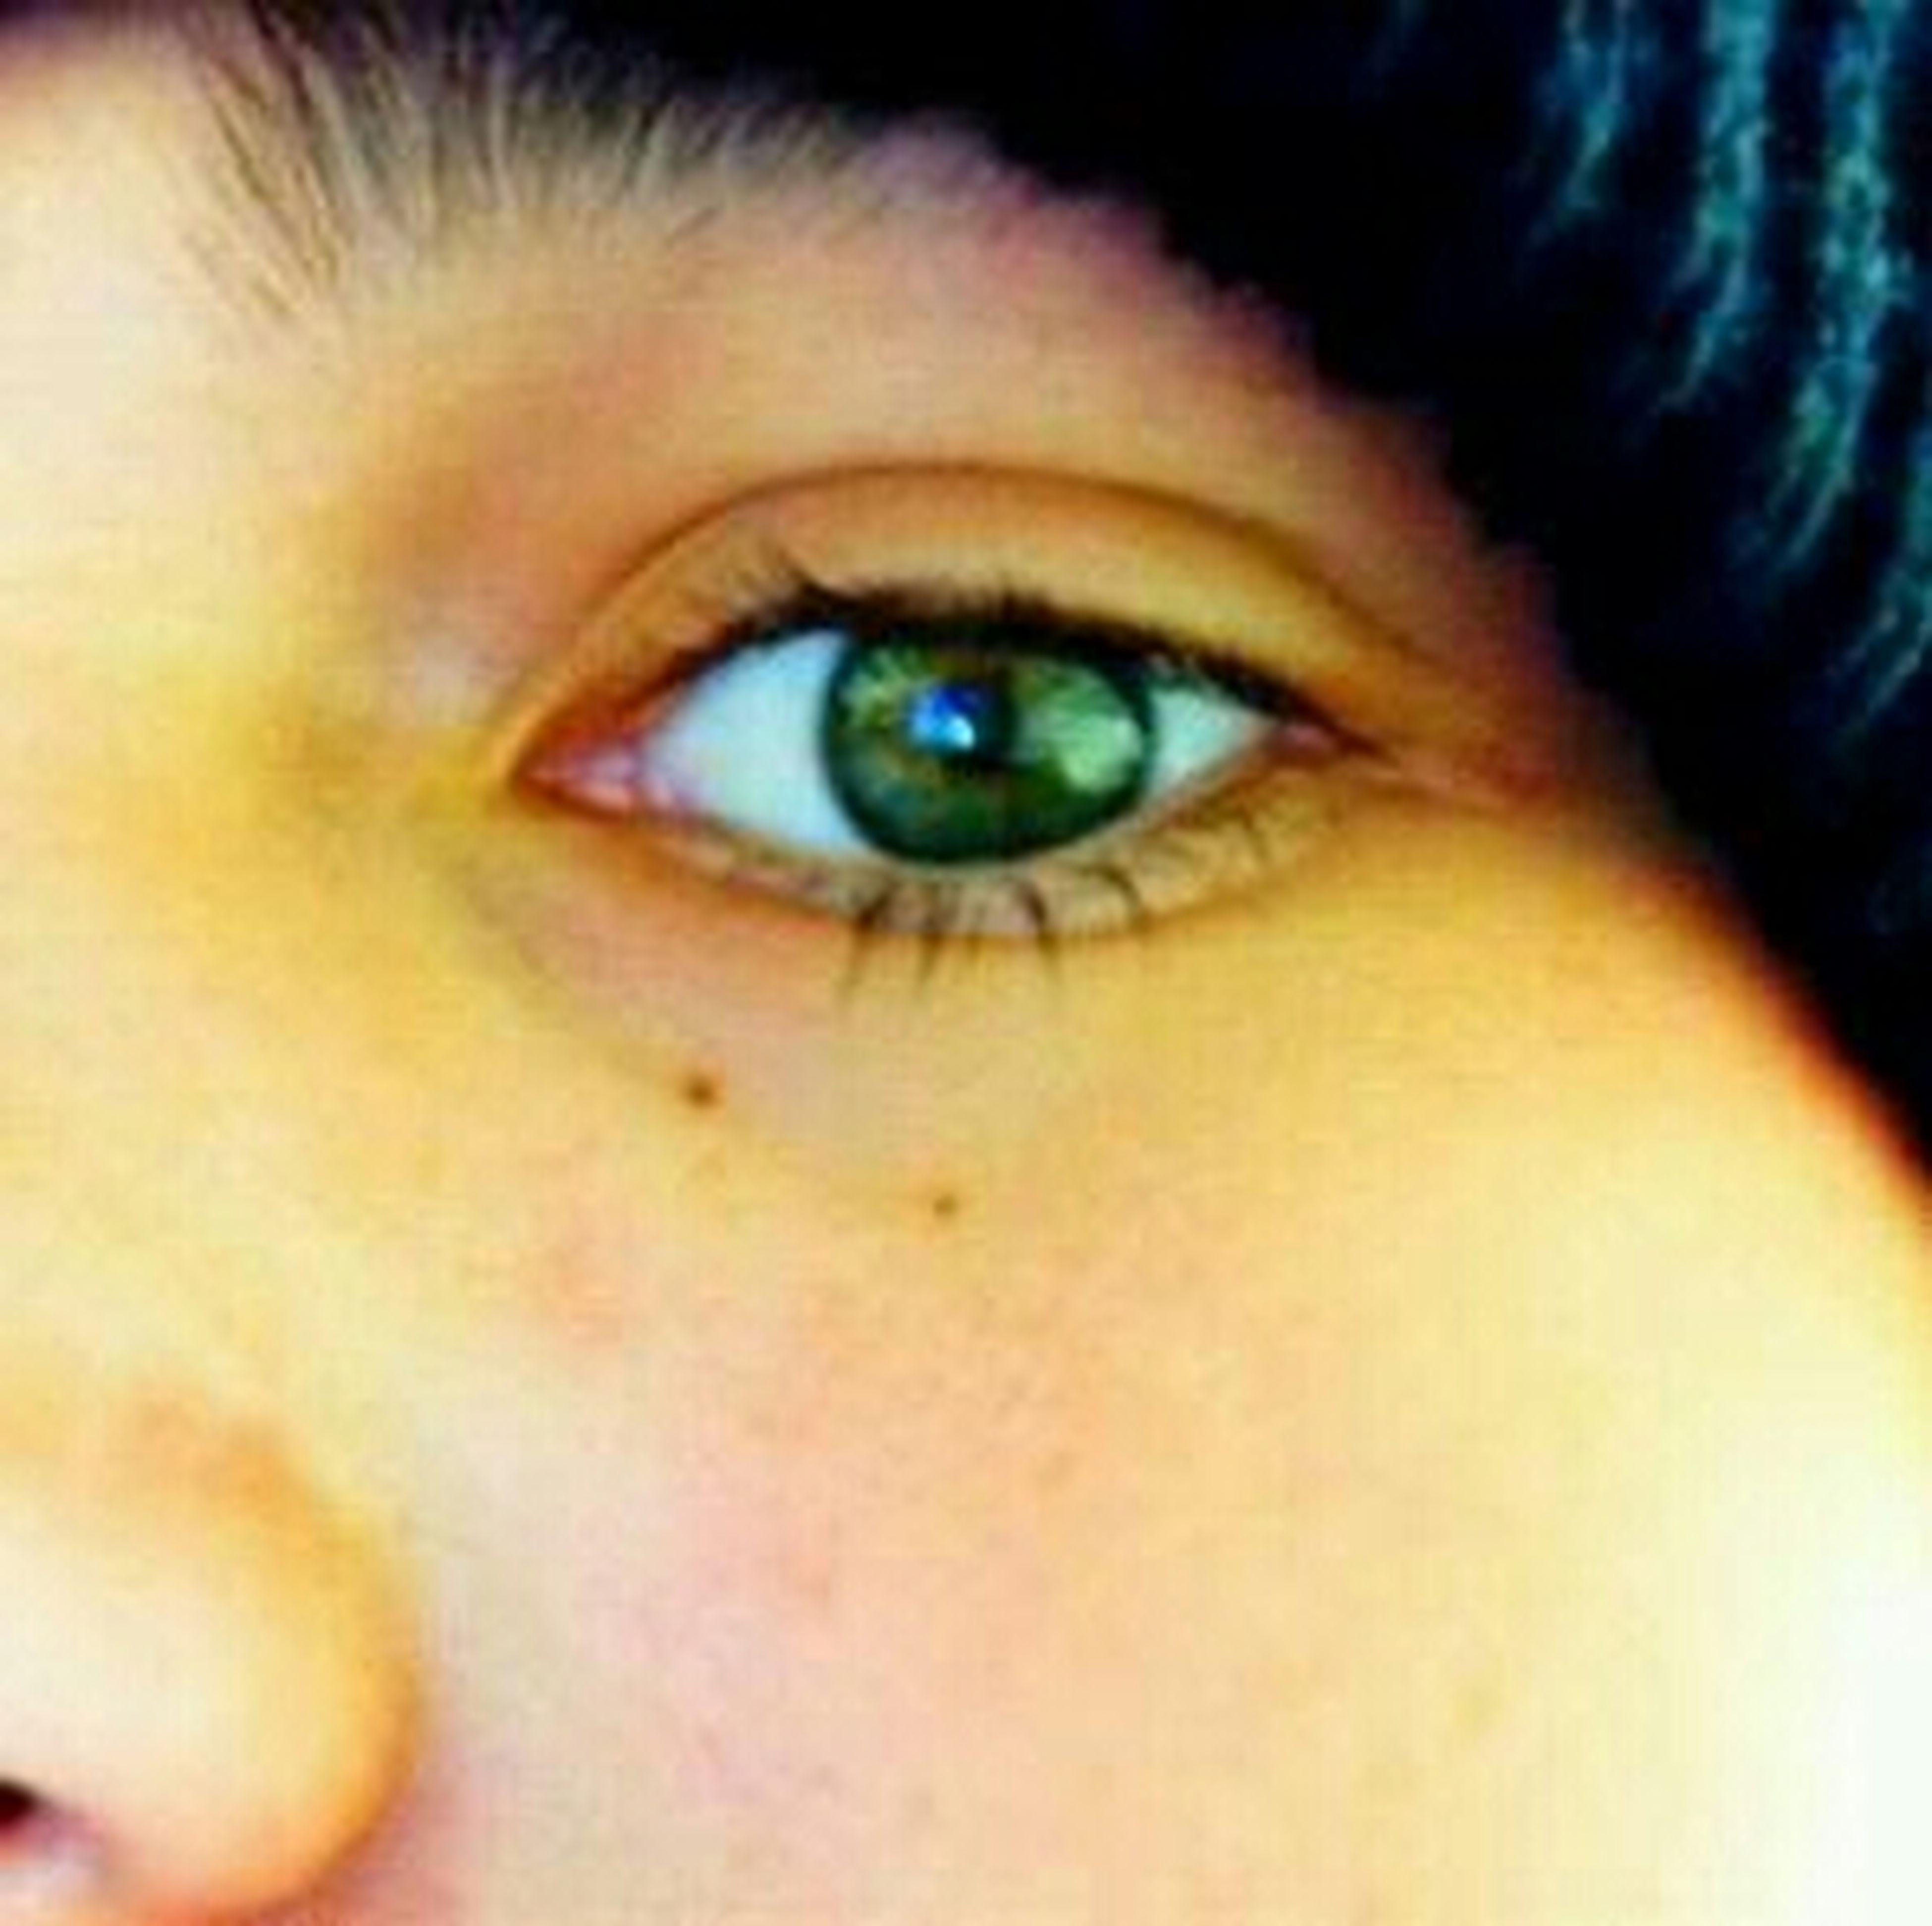 human eye, looking at camera, close-up, eyelash, portrait, eyesight, human face, sensory perception, lifestyles, part of, headshot, iris - eye, indoors, extreme close-up, eyeball, staring, extreme close up